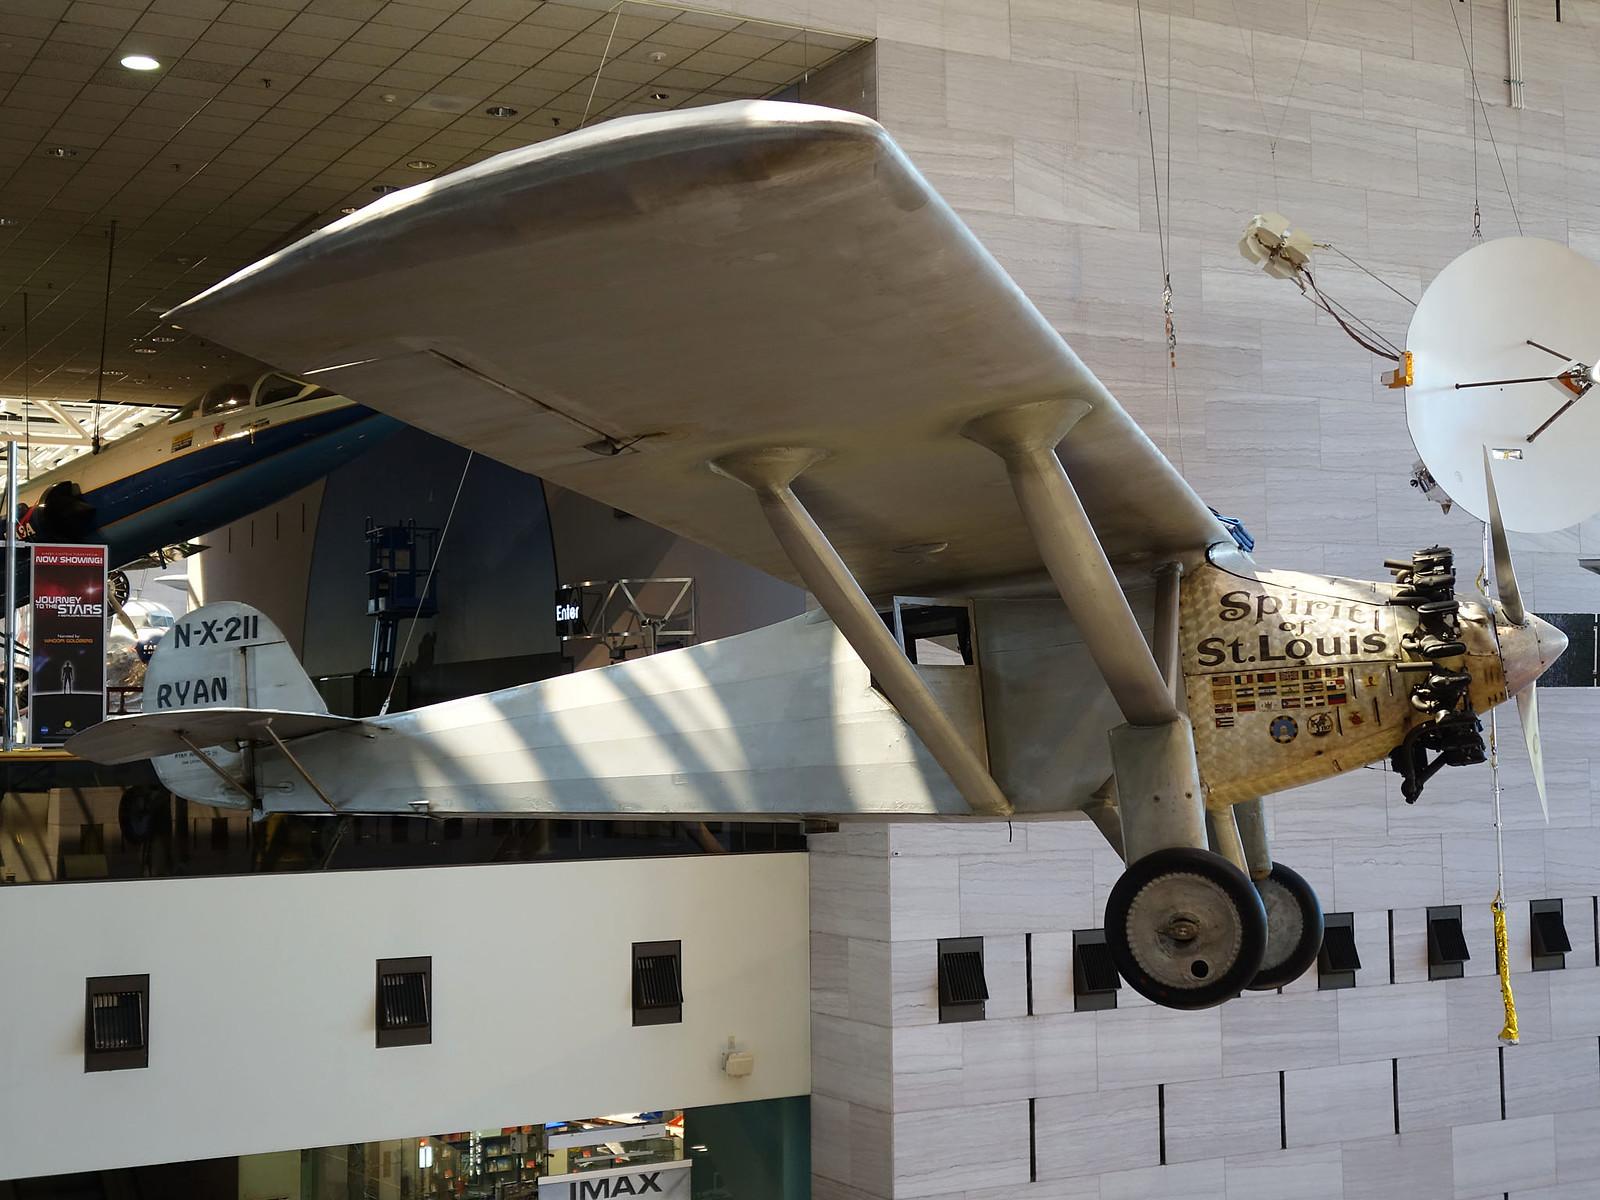 Spirit of Saint Louis - Charles Lindbergh